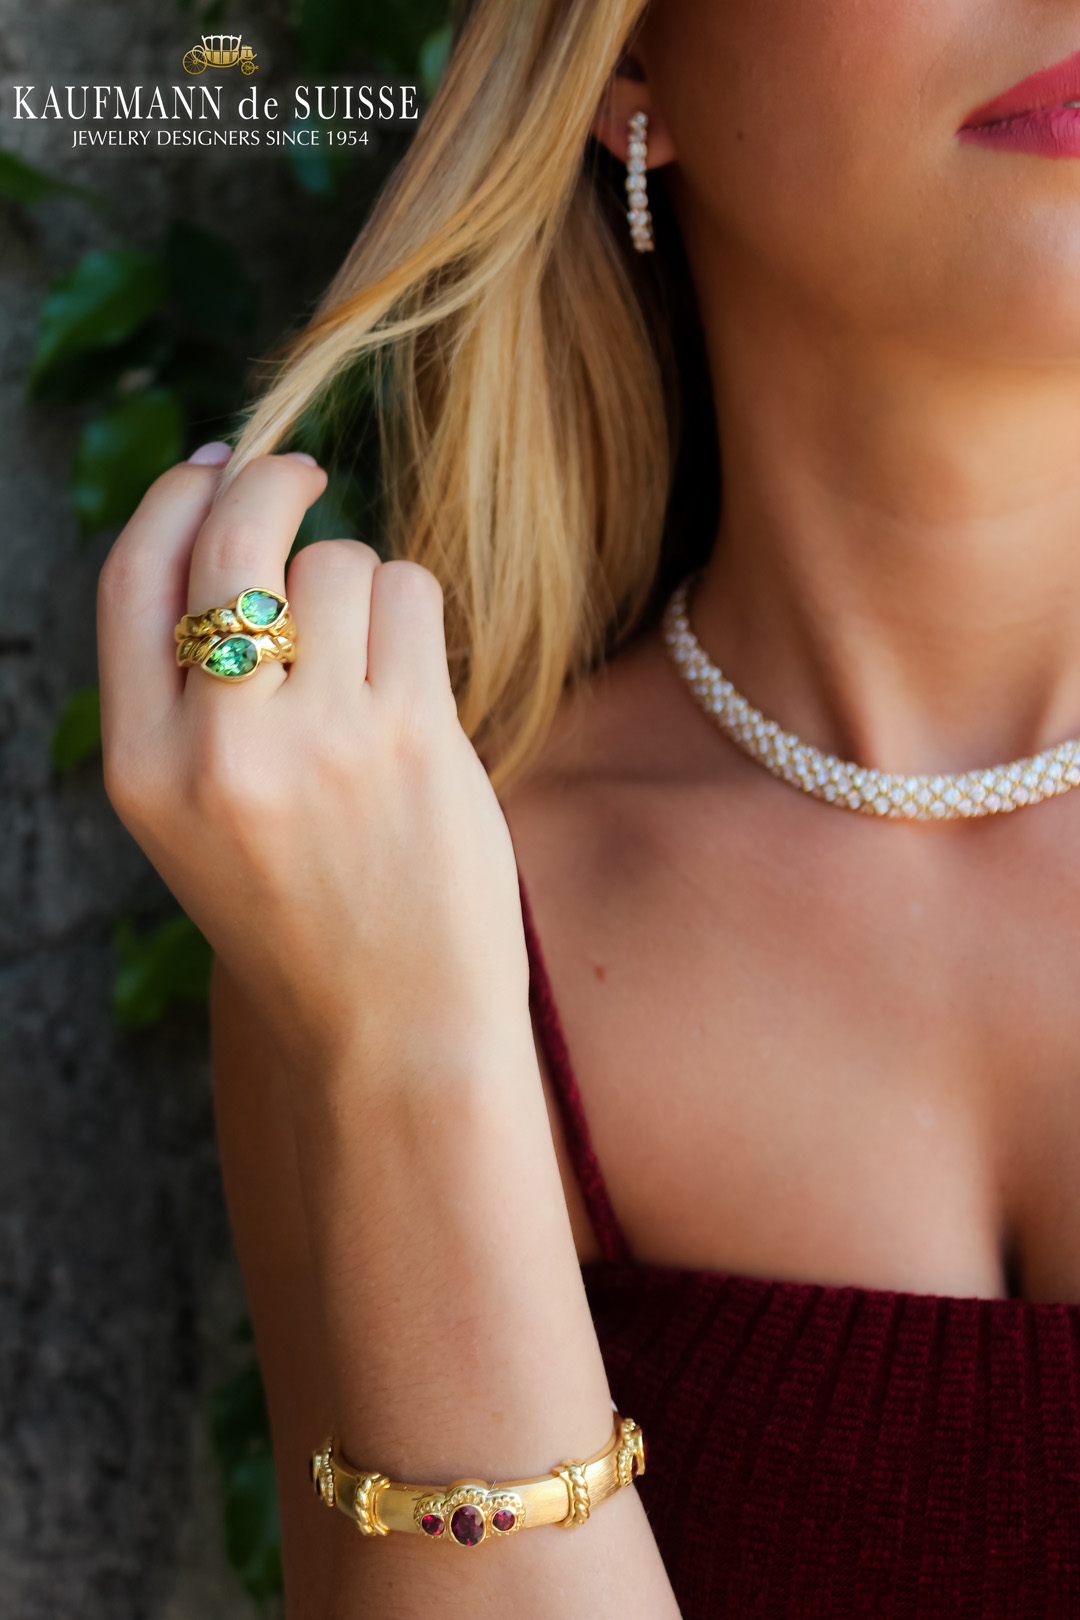 18K Yellow Gold and Green Tourmaline Ring & 18K Rhodolite Garnet Bracelet